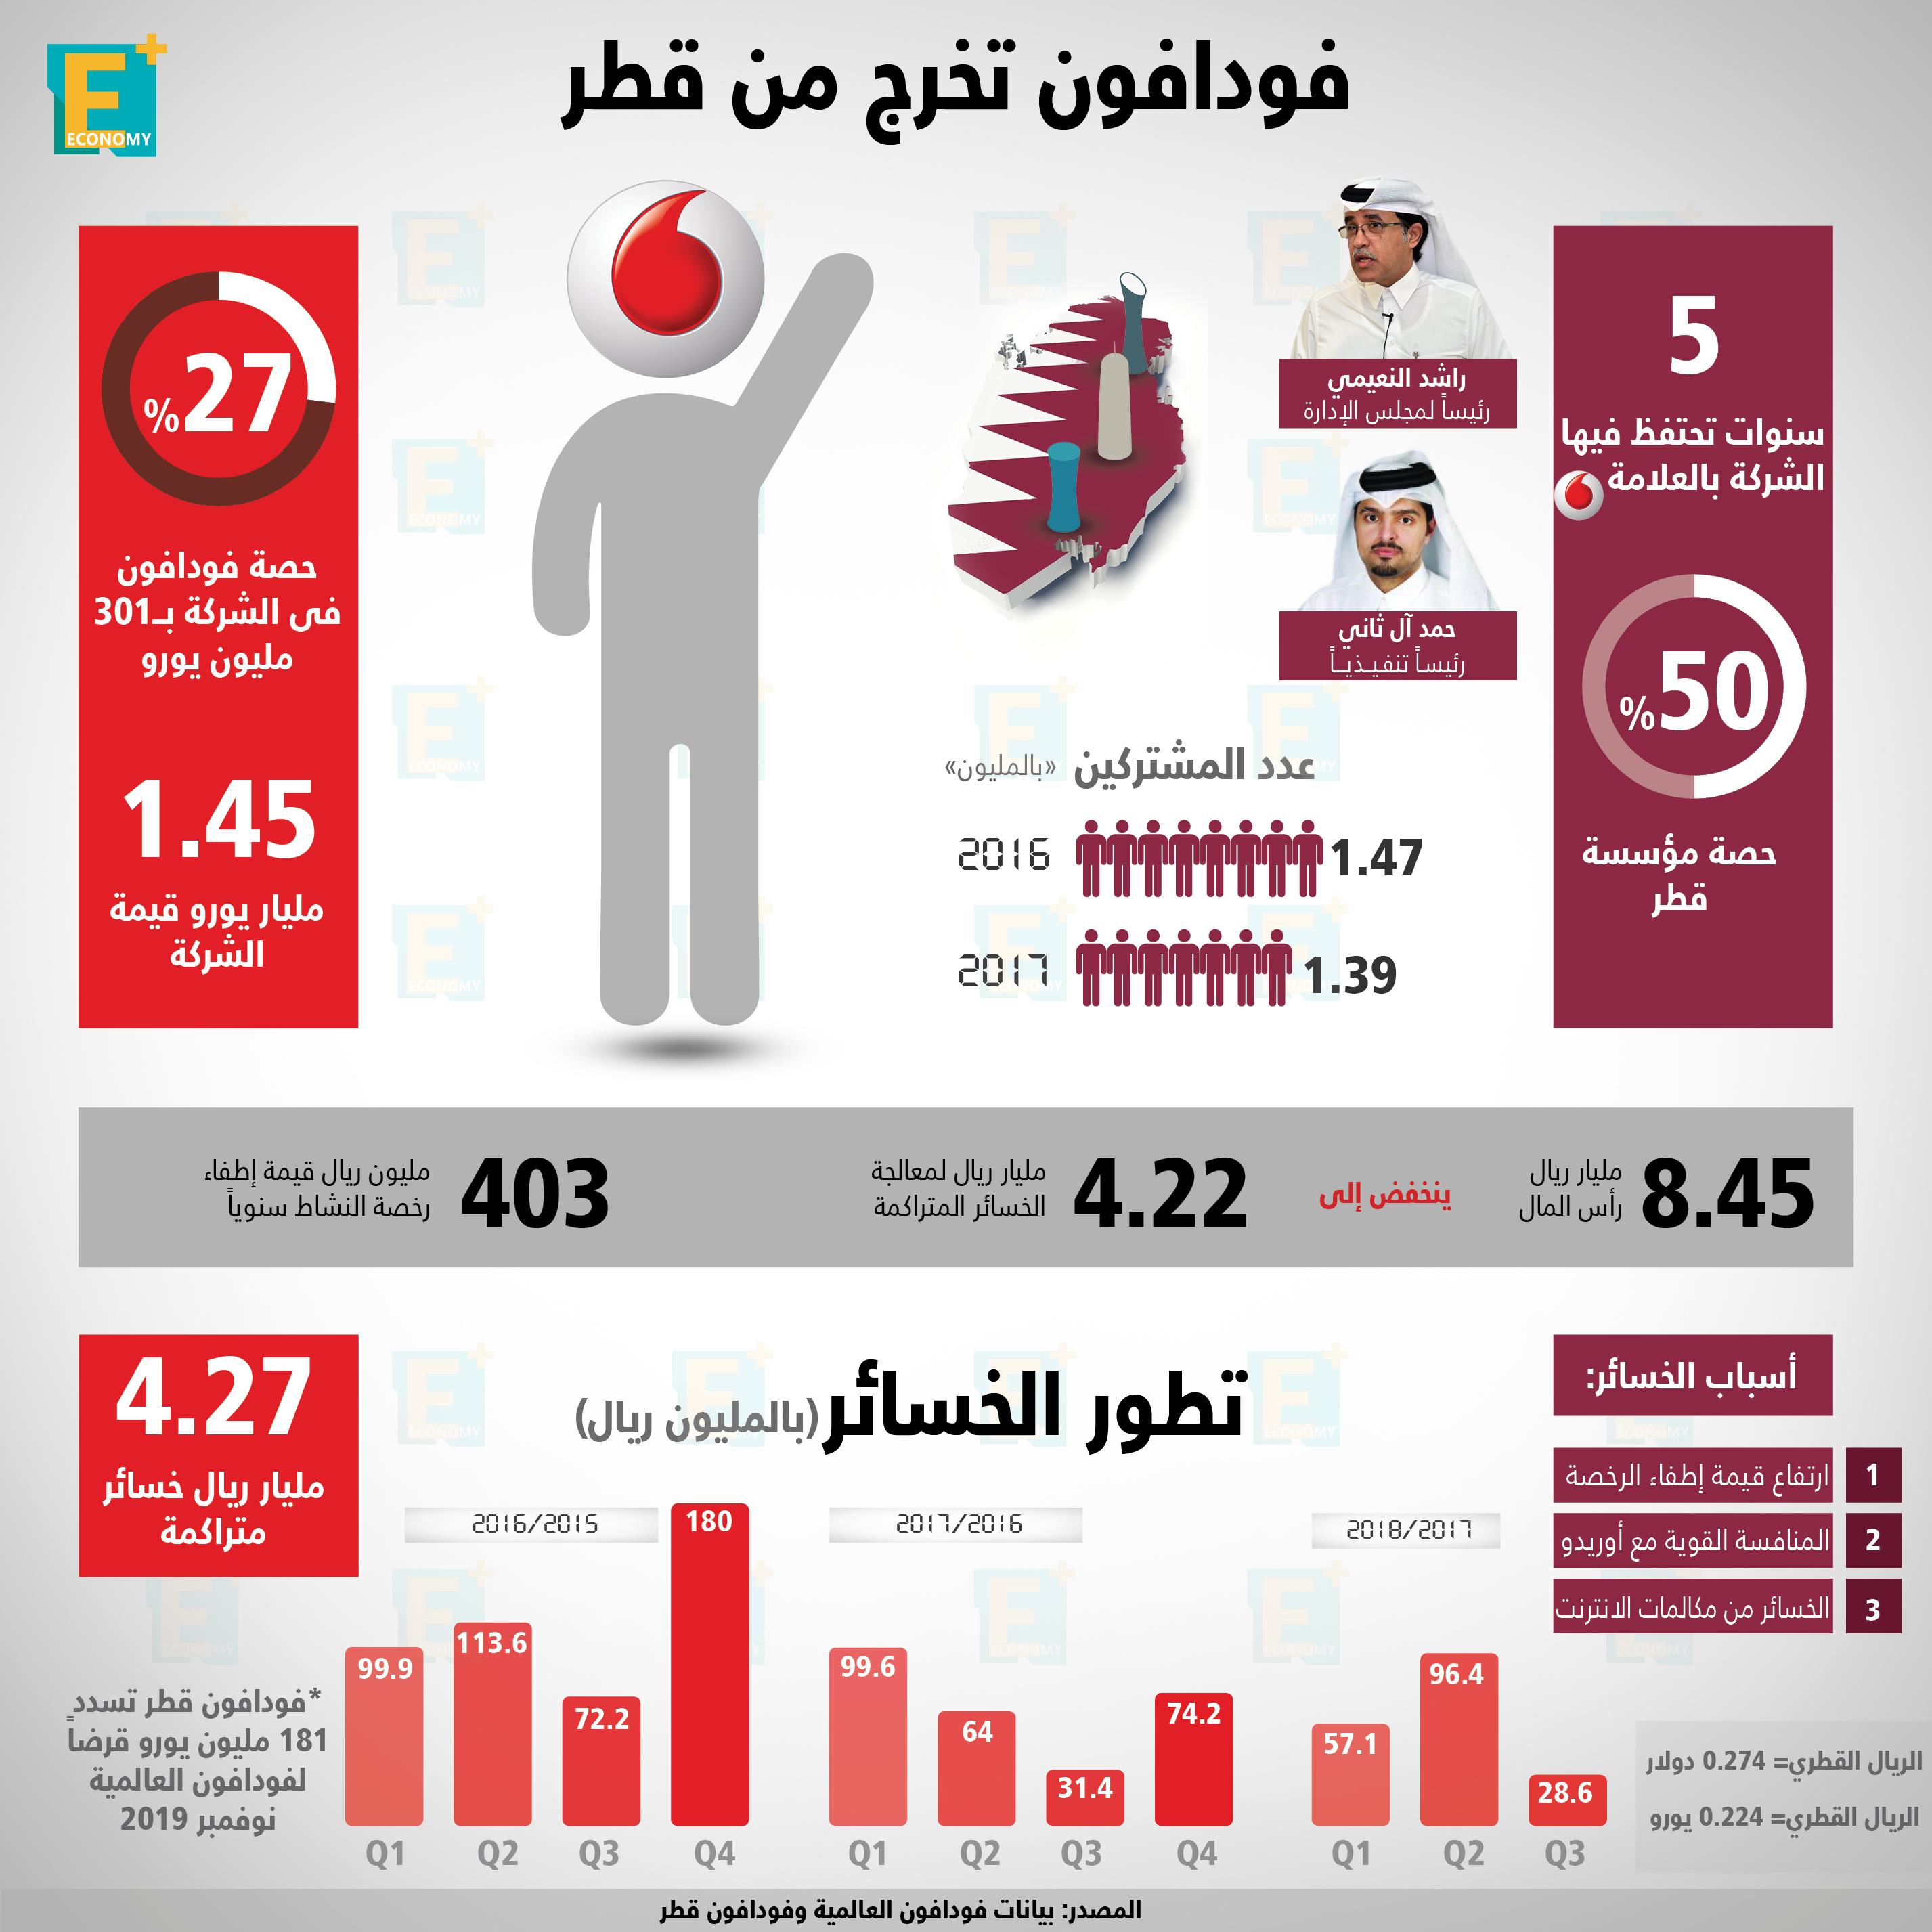 فودافون تخرج من قطر